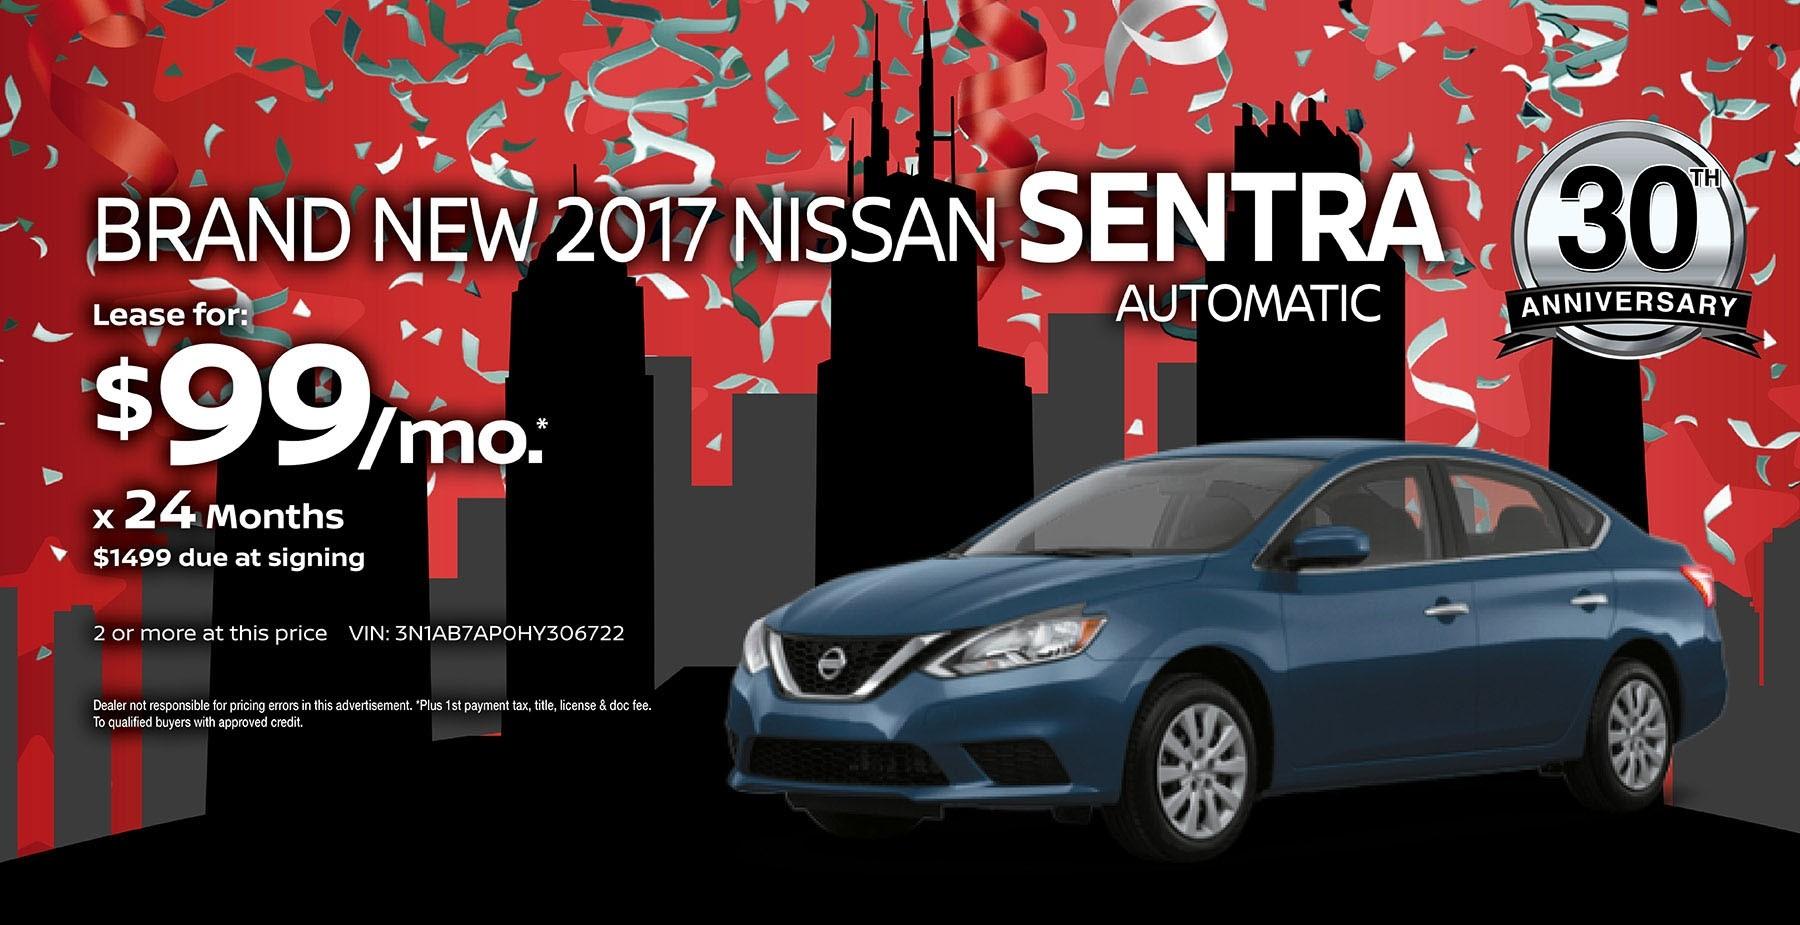 2017 Nissan Sentra July Sale at Star Nissan